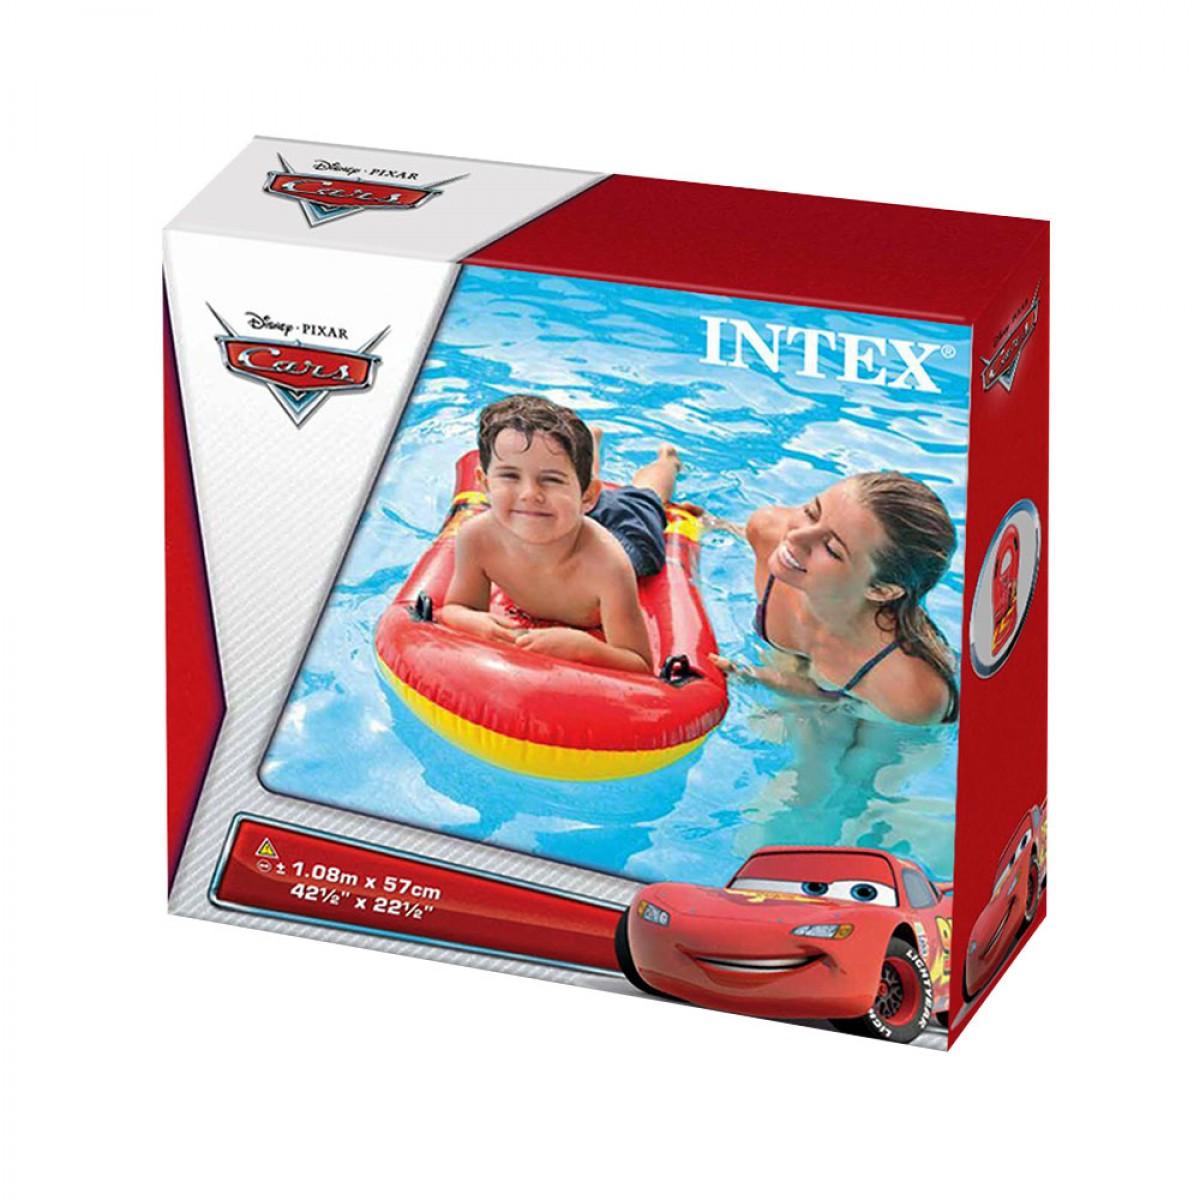 INTEX ΦΟΥΣΚΩΤΗ ΣΑΝΙΔΑ SURF CARS 58161 (108Χ57 ΕΚ.)